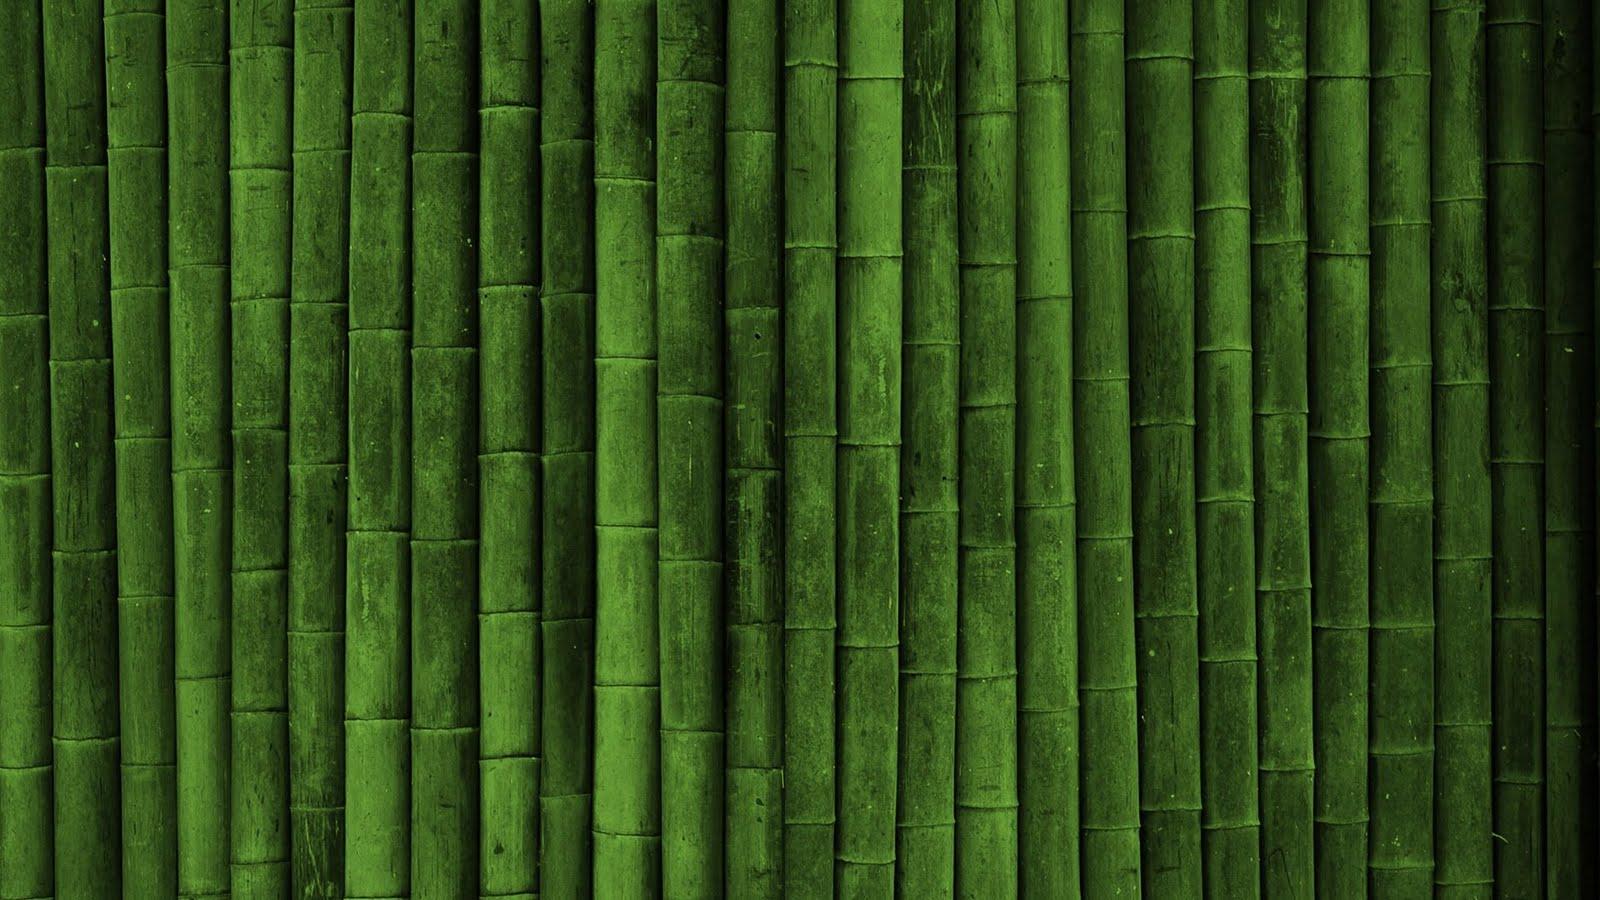 HD Bamboo Plant Wallpapers | Desktop Wallpapers